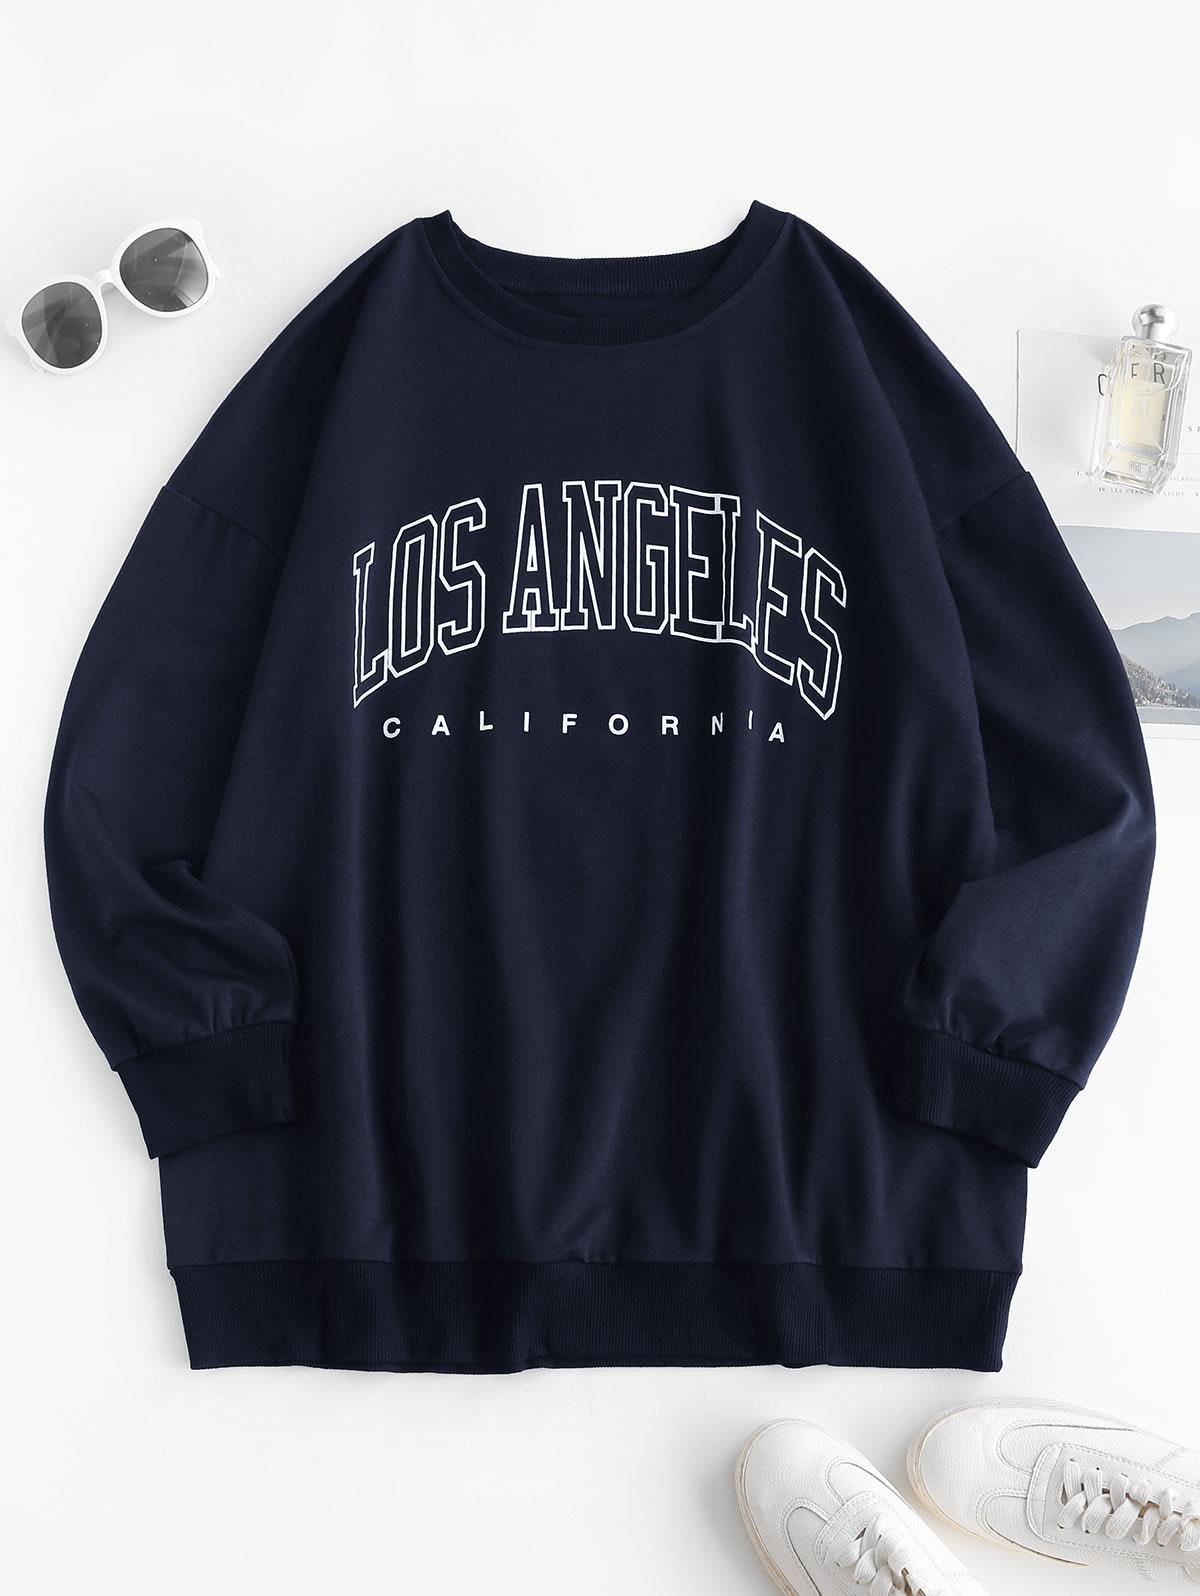 Sweat-shirtStyleBoyfriendLettreGraphique Xl Bleu profond